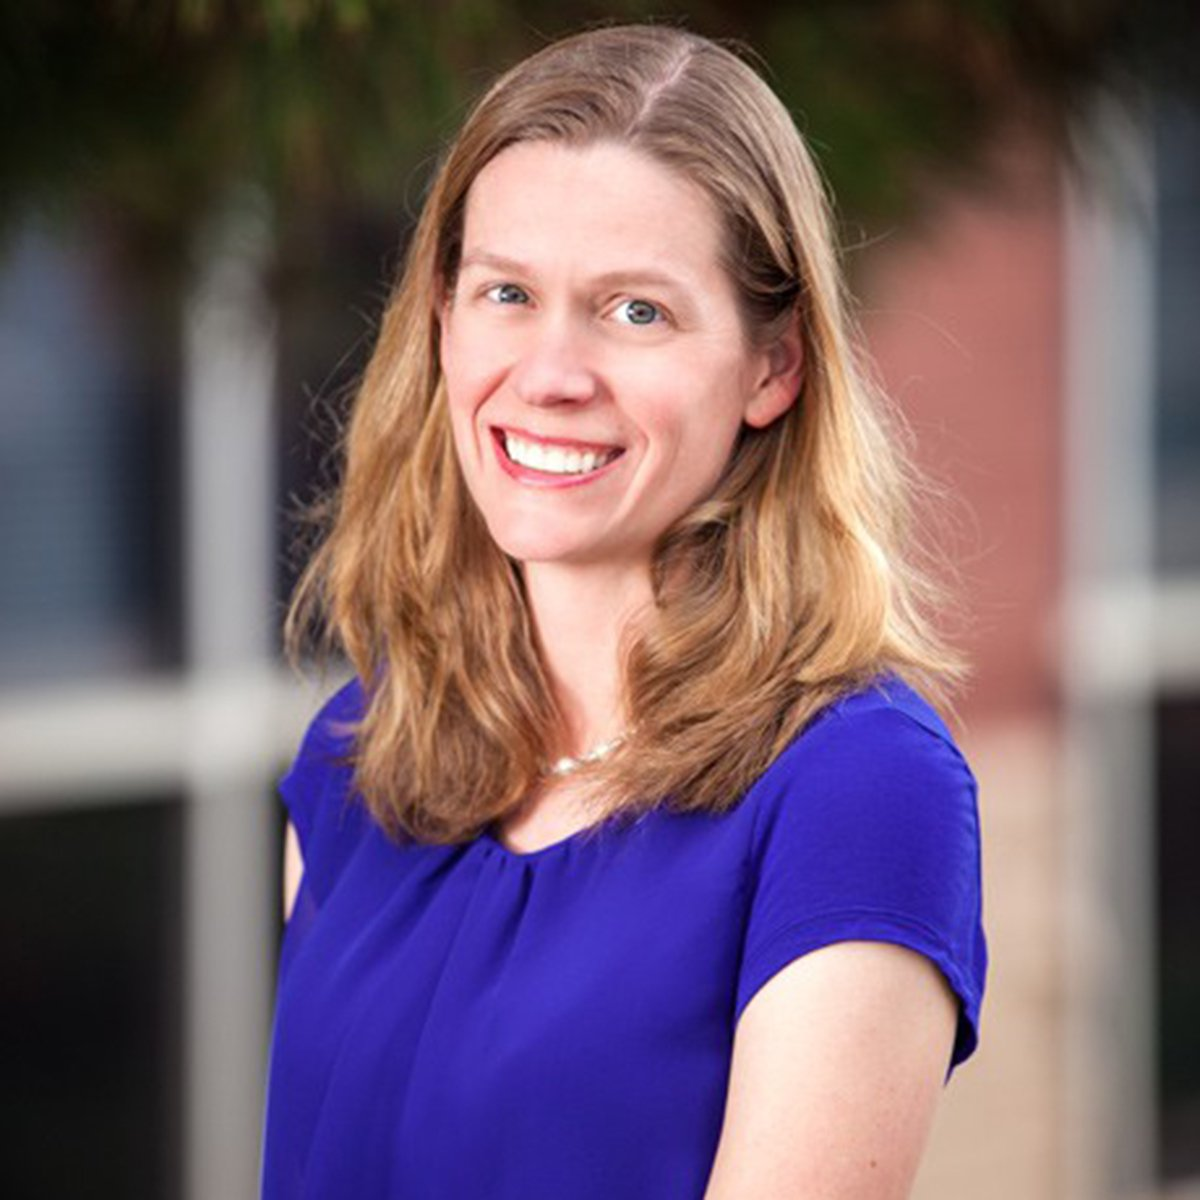 Dr. Heather Cribbs PeakMed